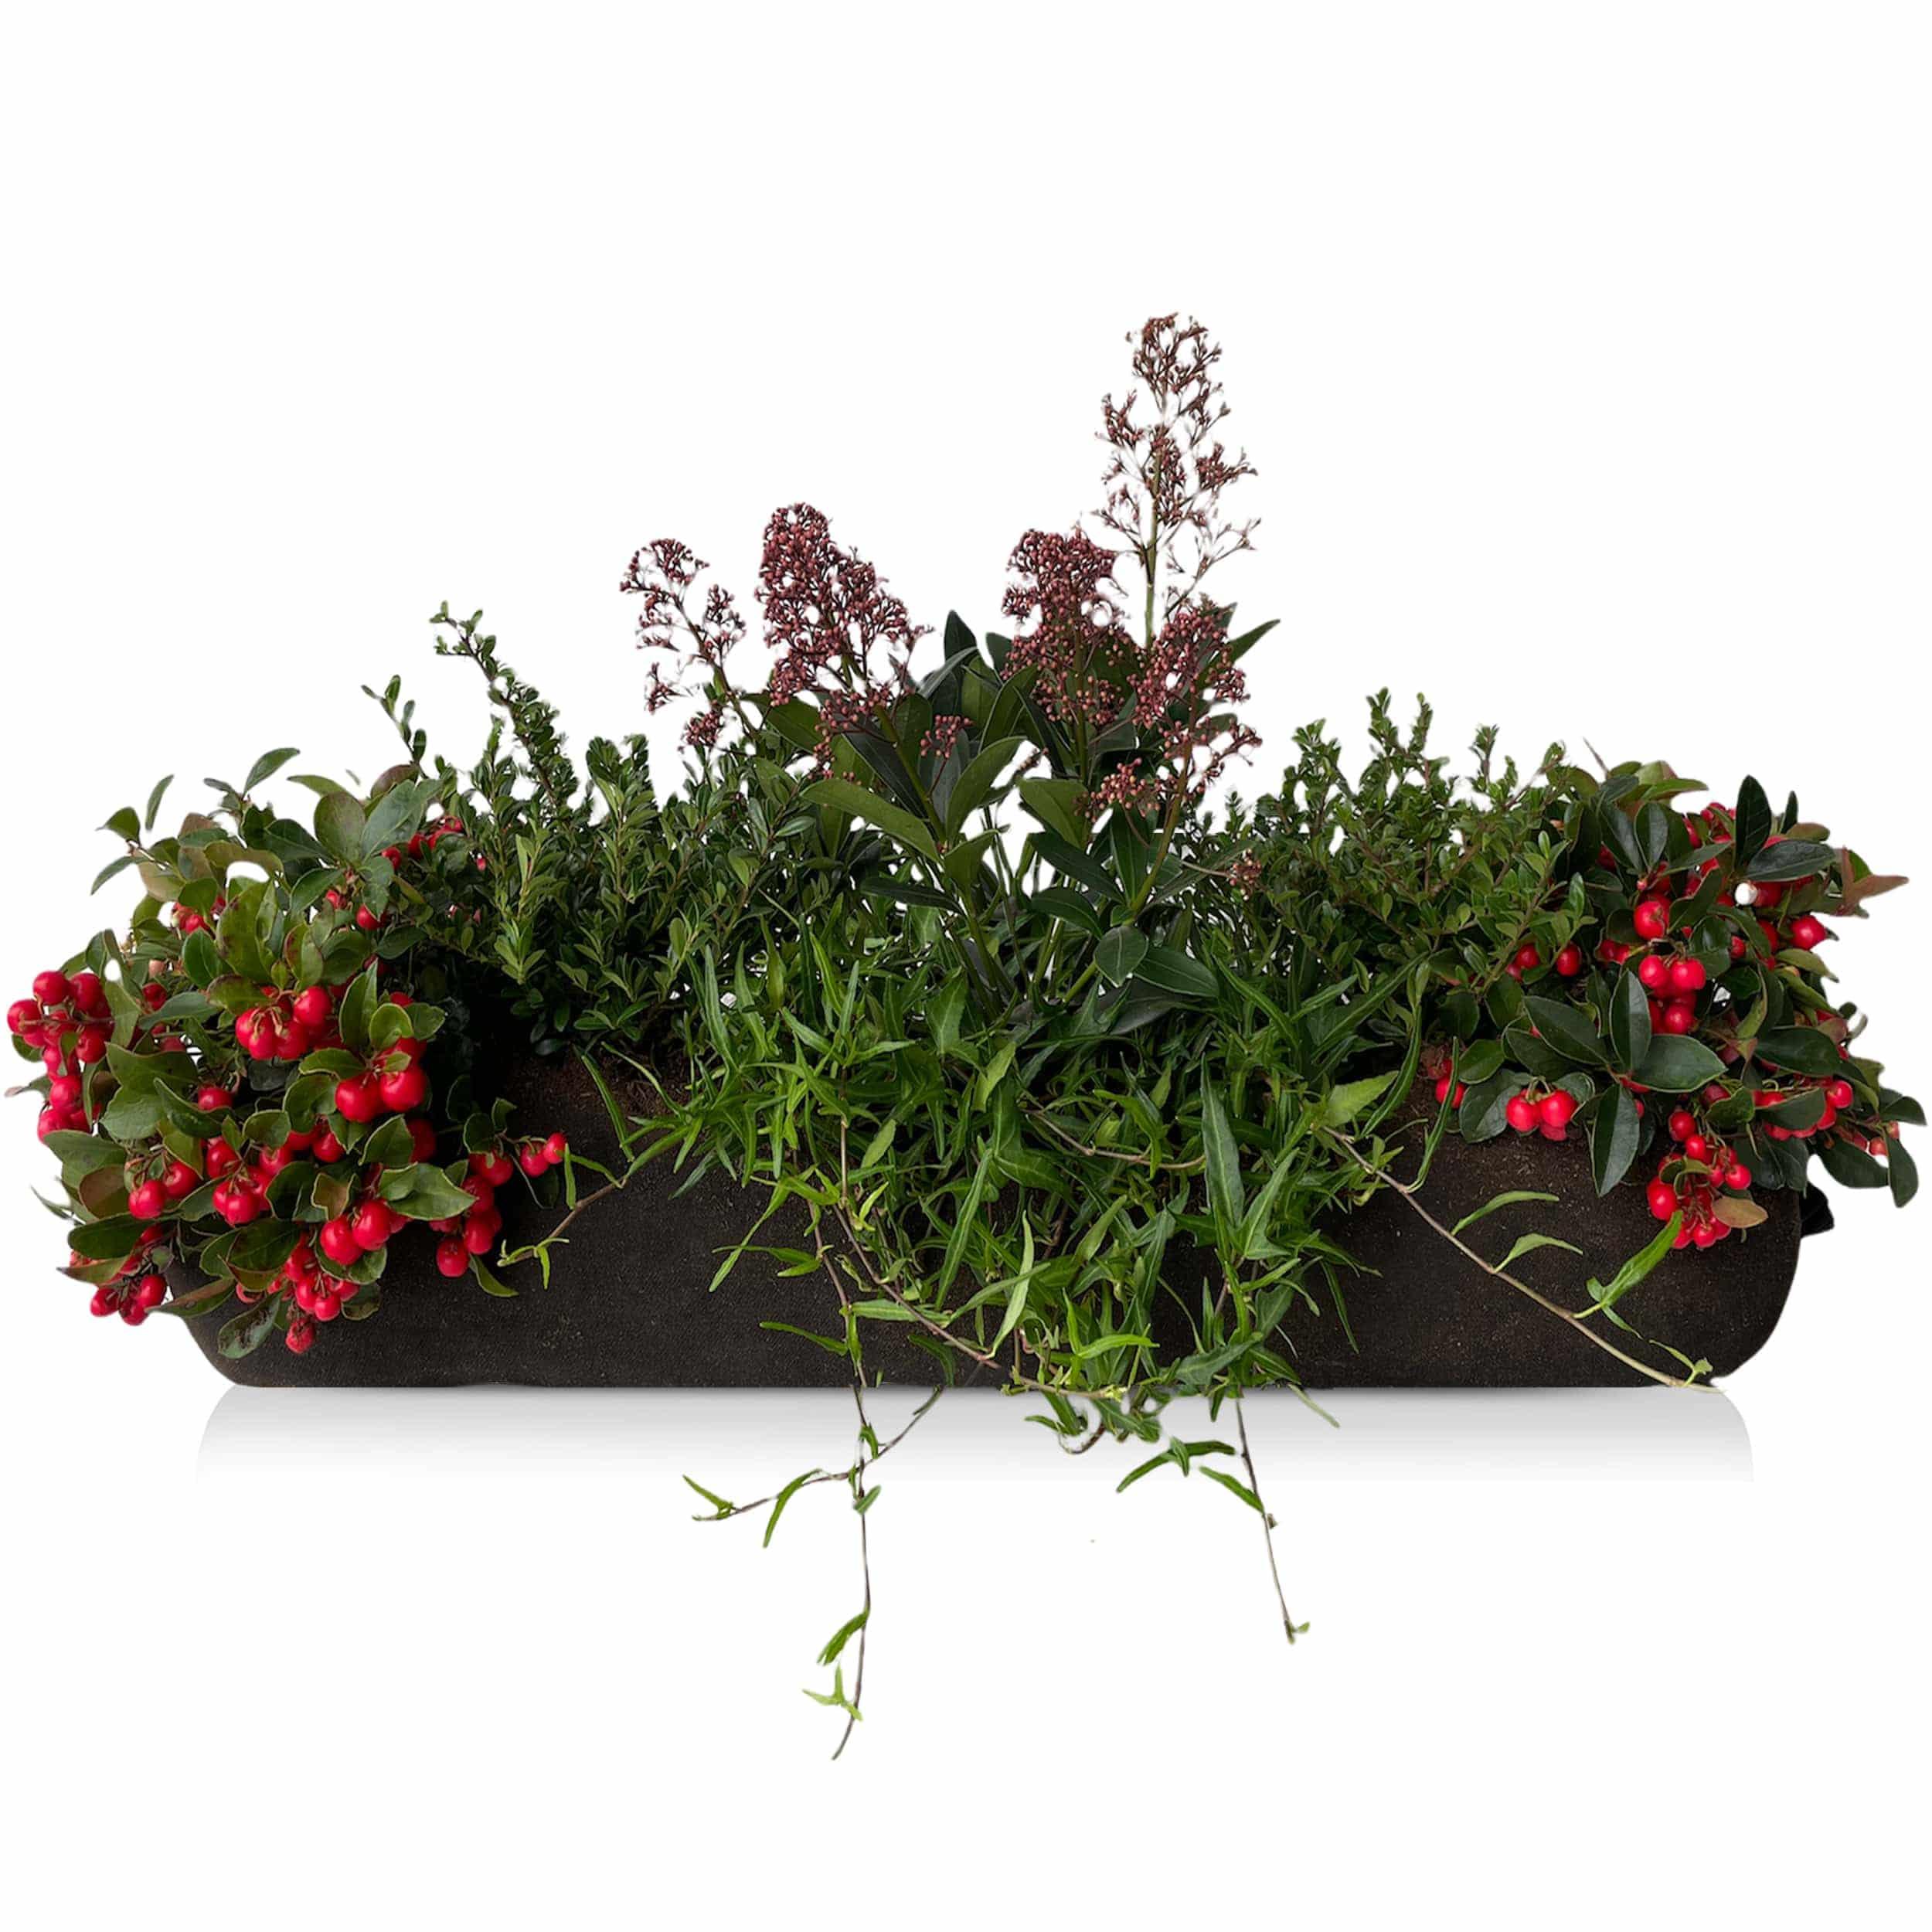 Winterblumen 'Beerenrot' Bag-Länge: 100 cm